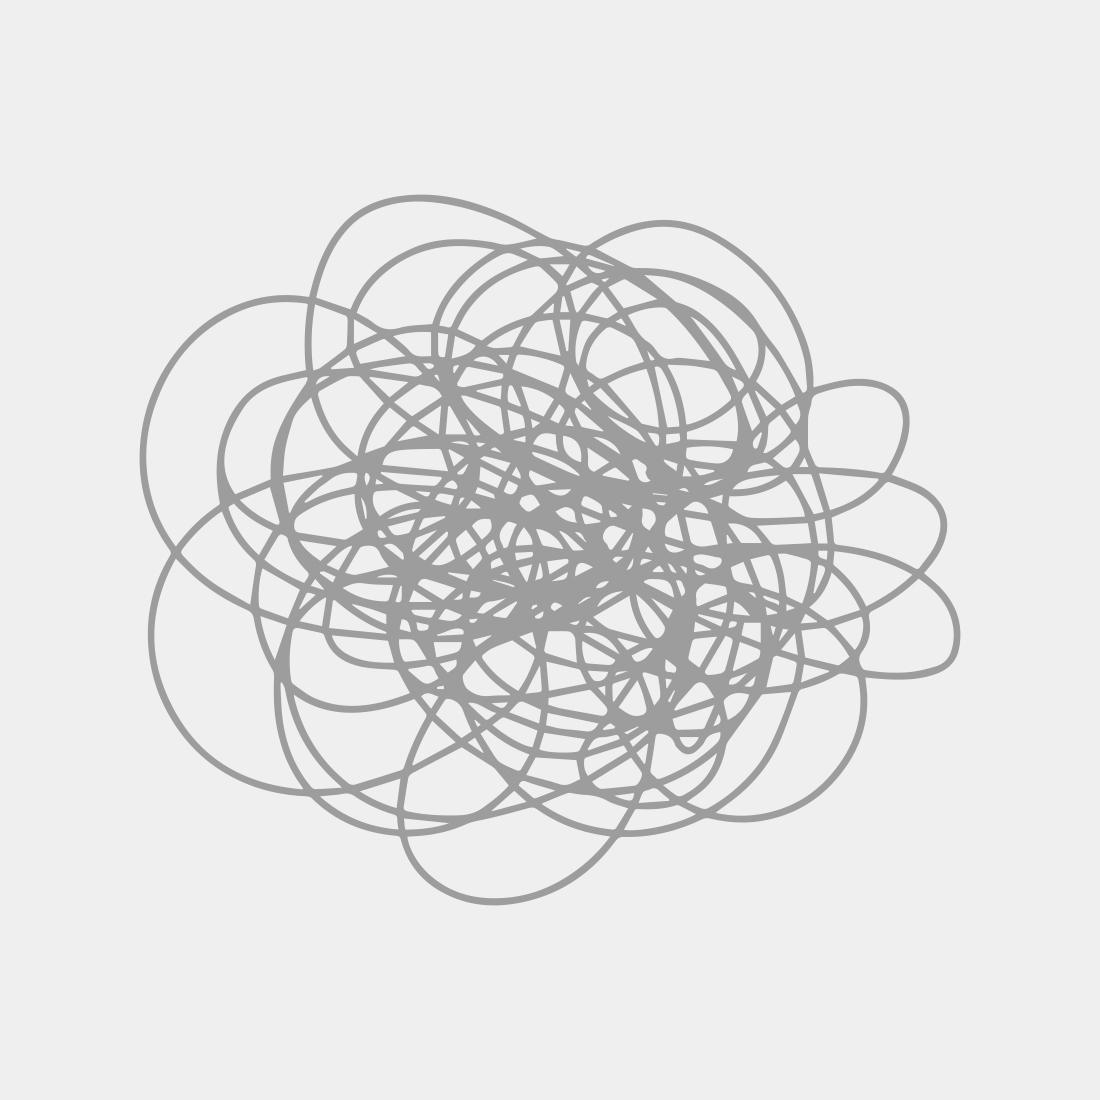 Daniel Wallis 'Orange Tom' Greetings Card